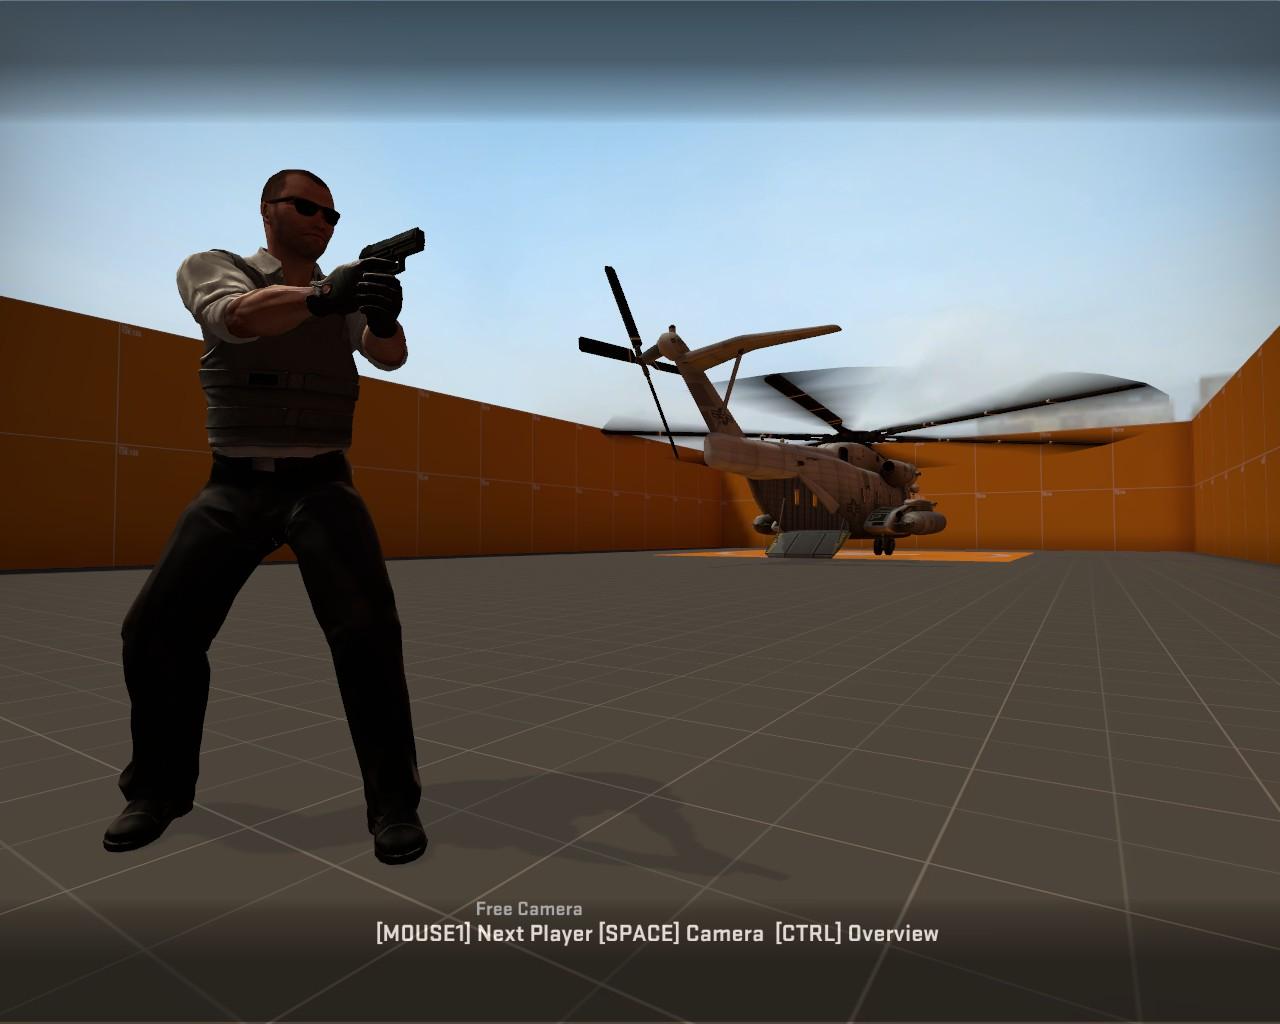 Assassination game mode WiP screenshot